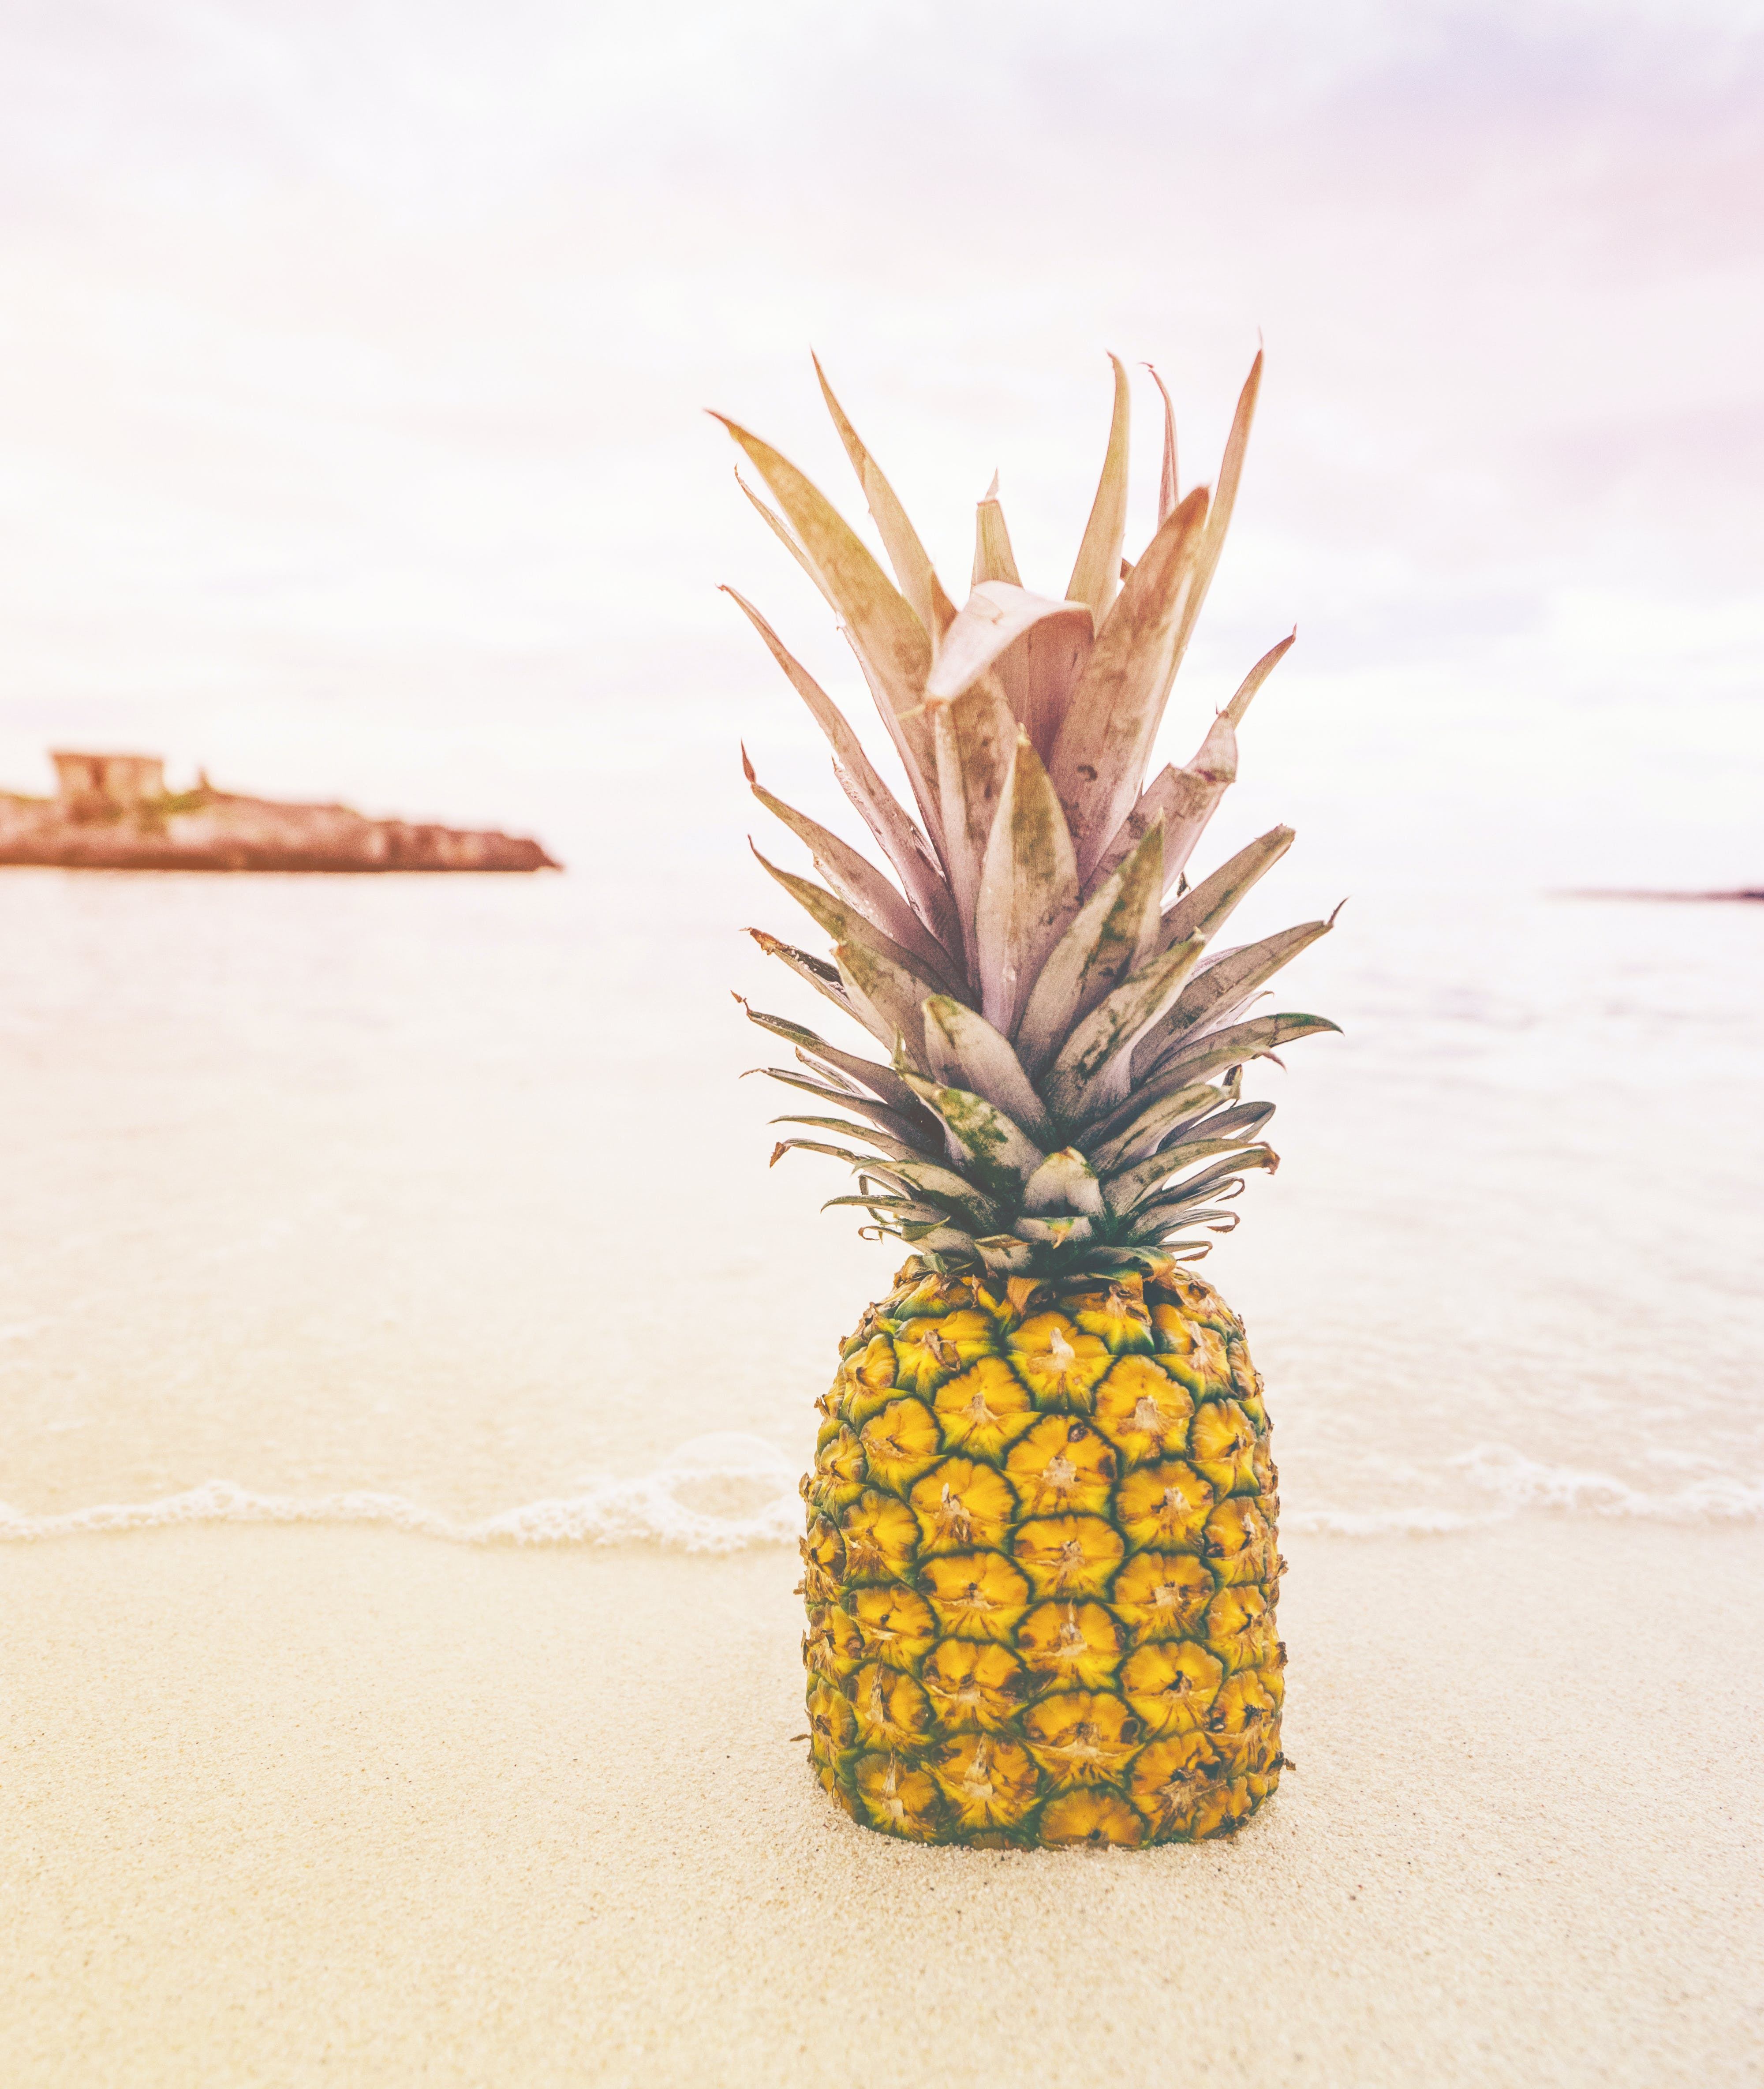 Pineapple at Beach Sand